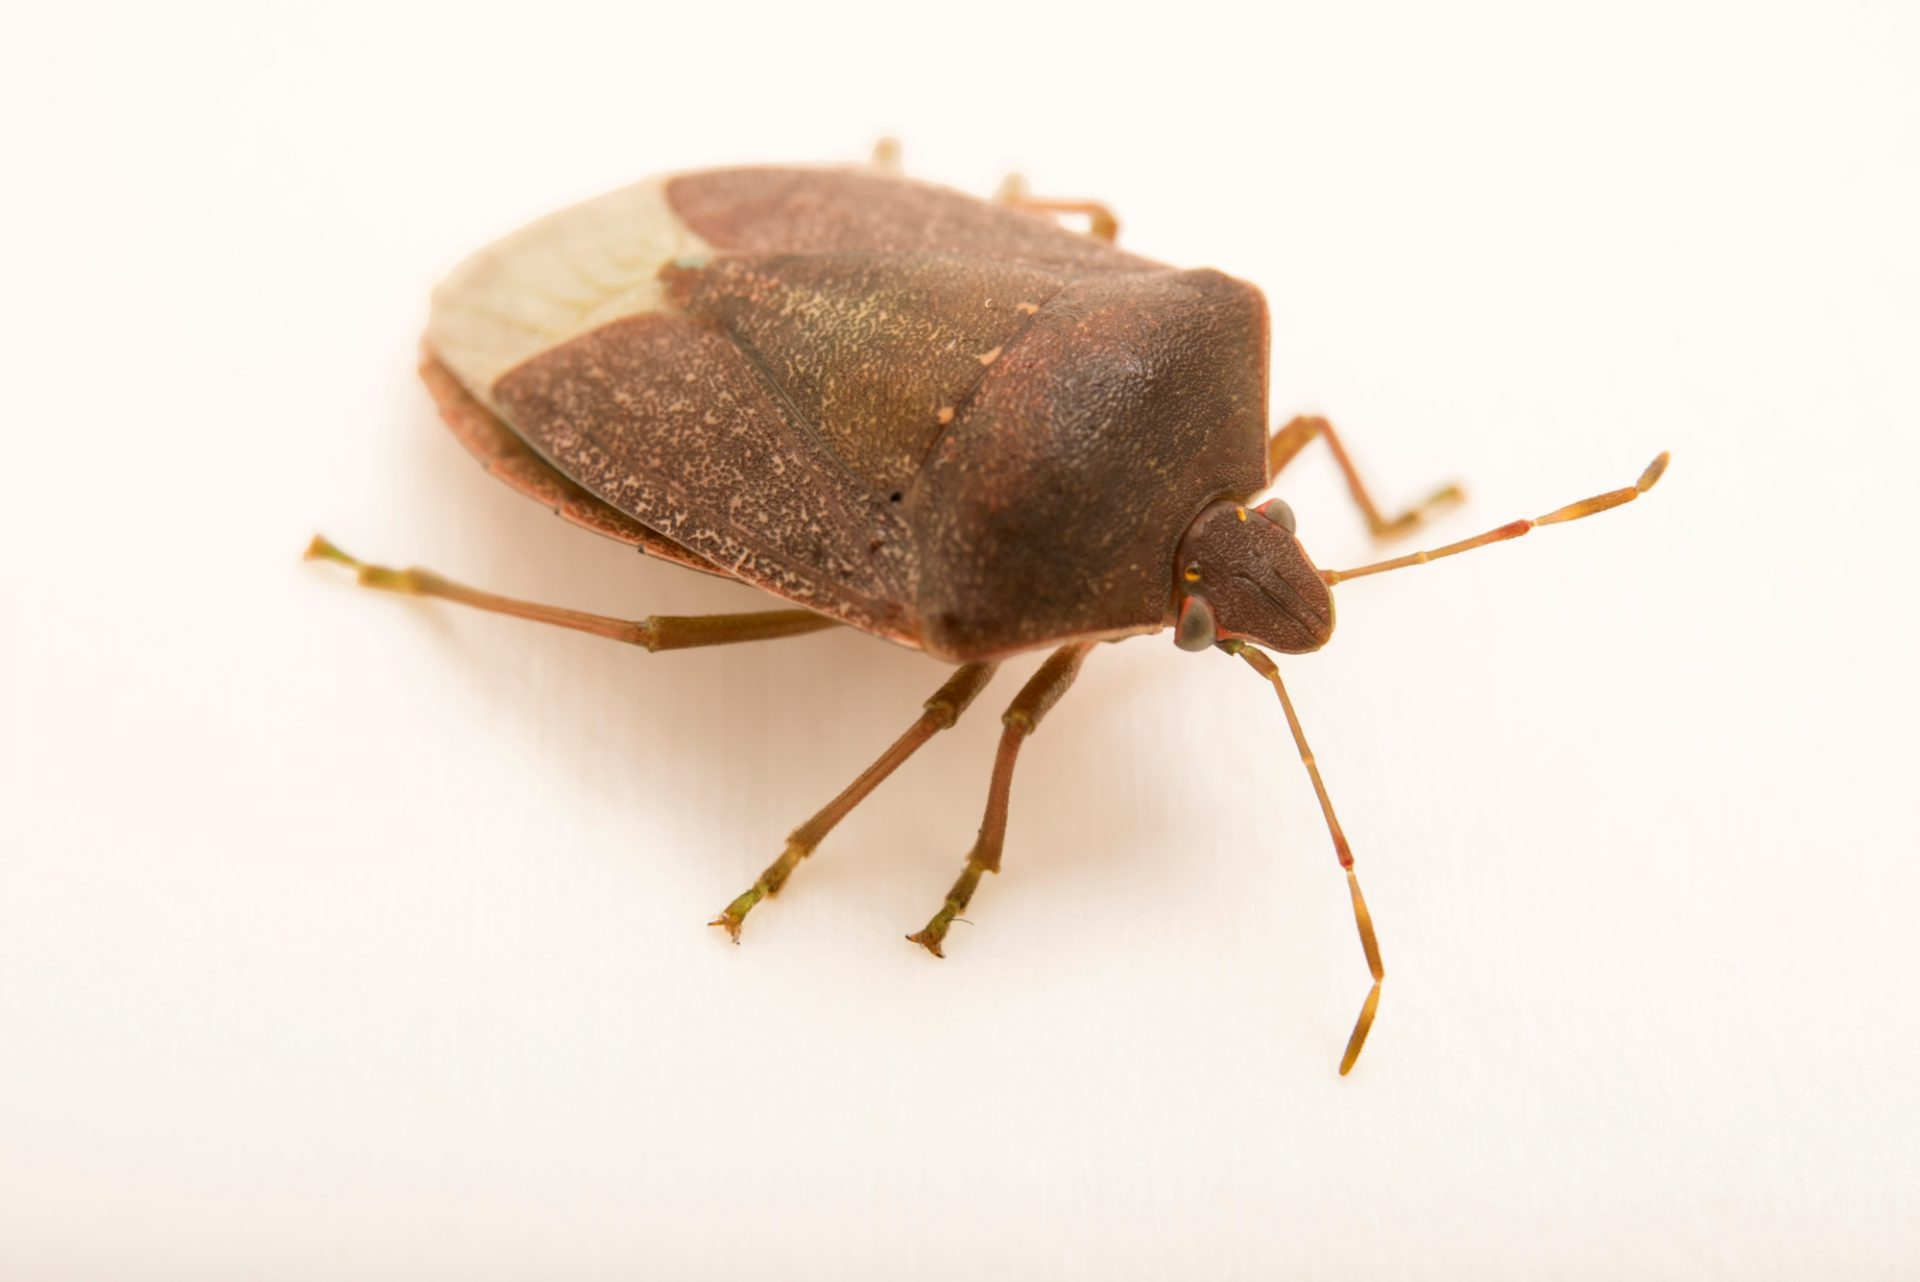 Photo: Southern green stink bug (Nezara viridula) from the wild.